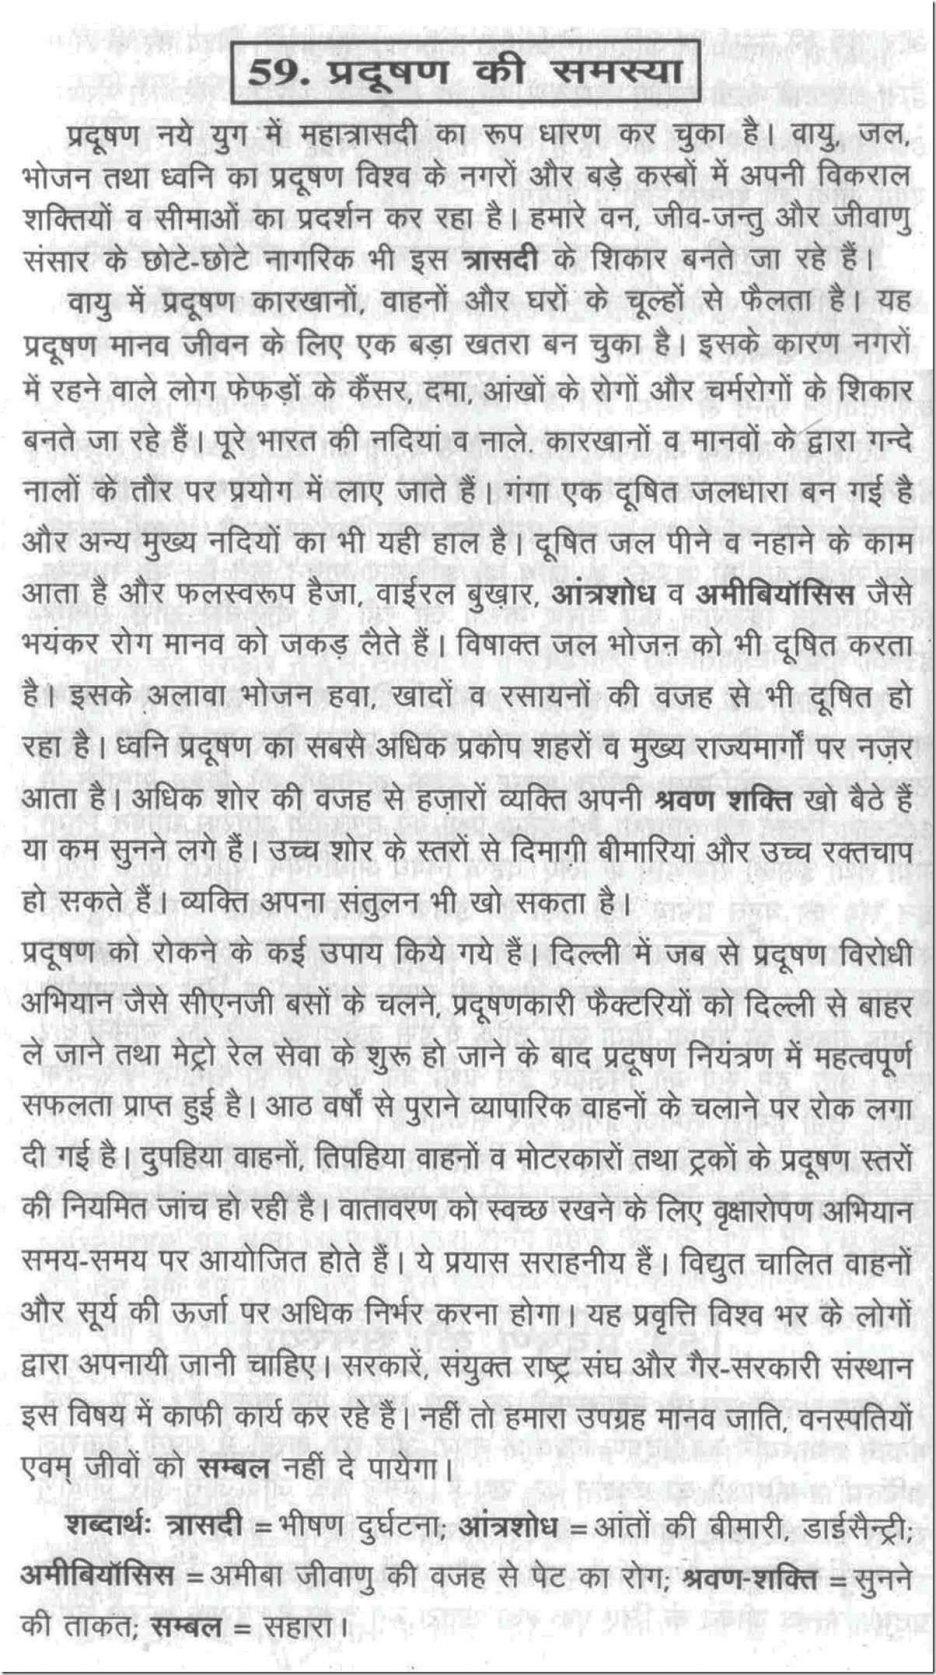 016 Essay Example Save Water Wikipedia Thumb Essays On In Hindi Language Marathi Punjabi For Class And Electricity Awful Life Tamil Gujarati Full